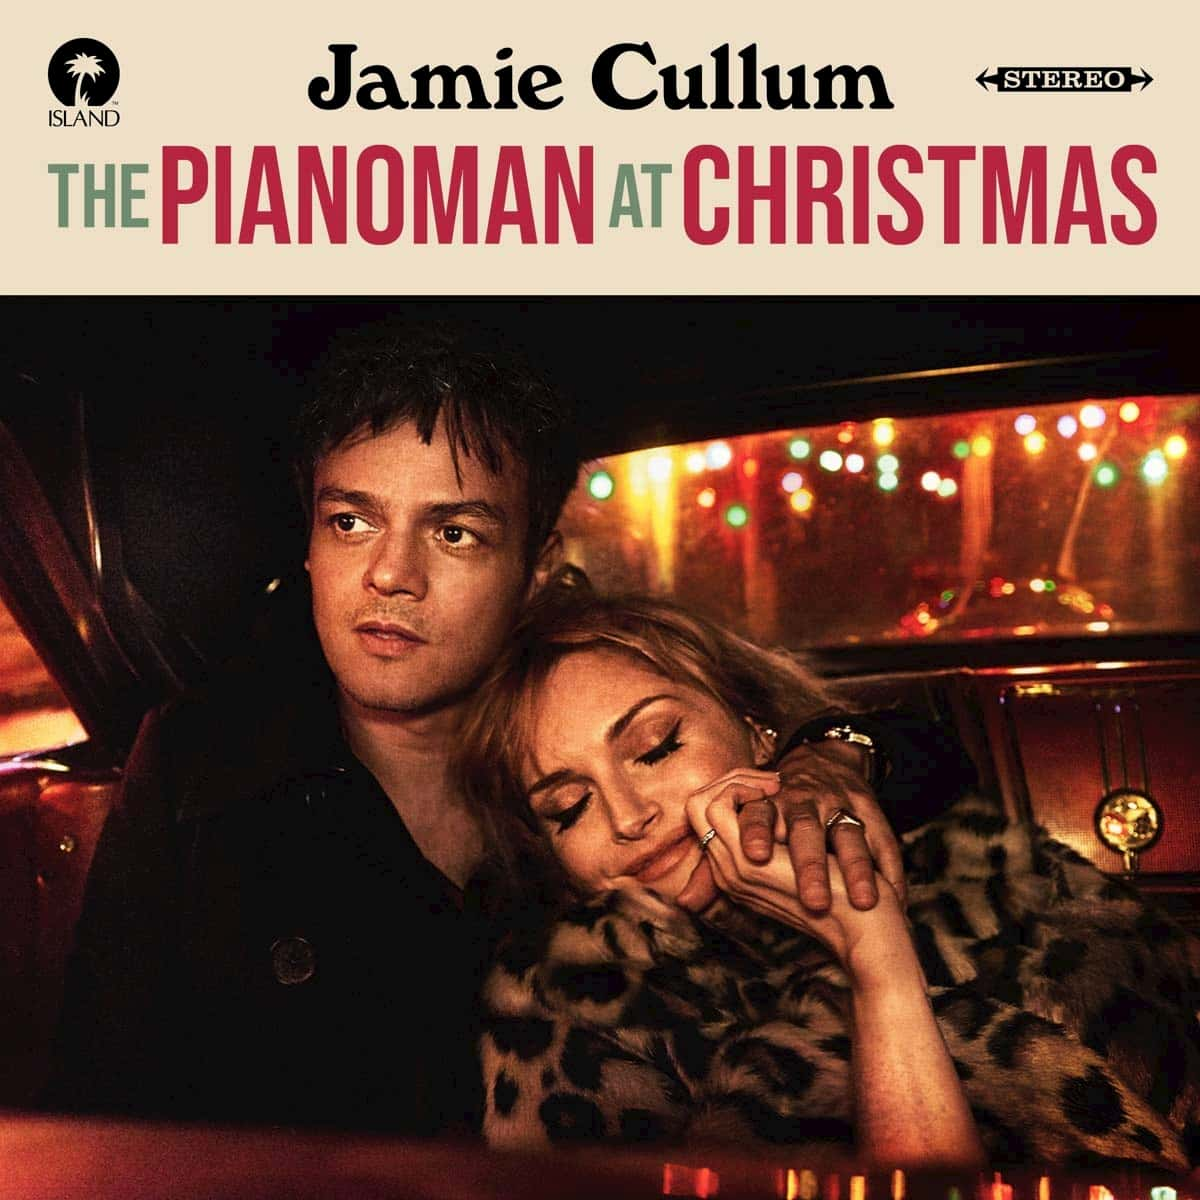 Jamie Cullum The Pianoman at Christmas - Weihnachts-Album 2020